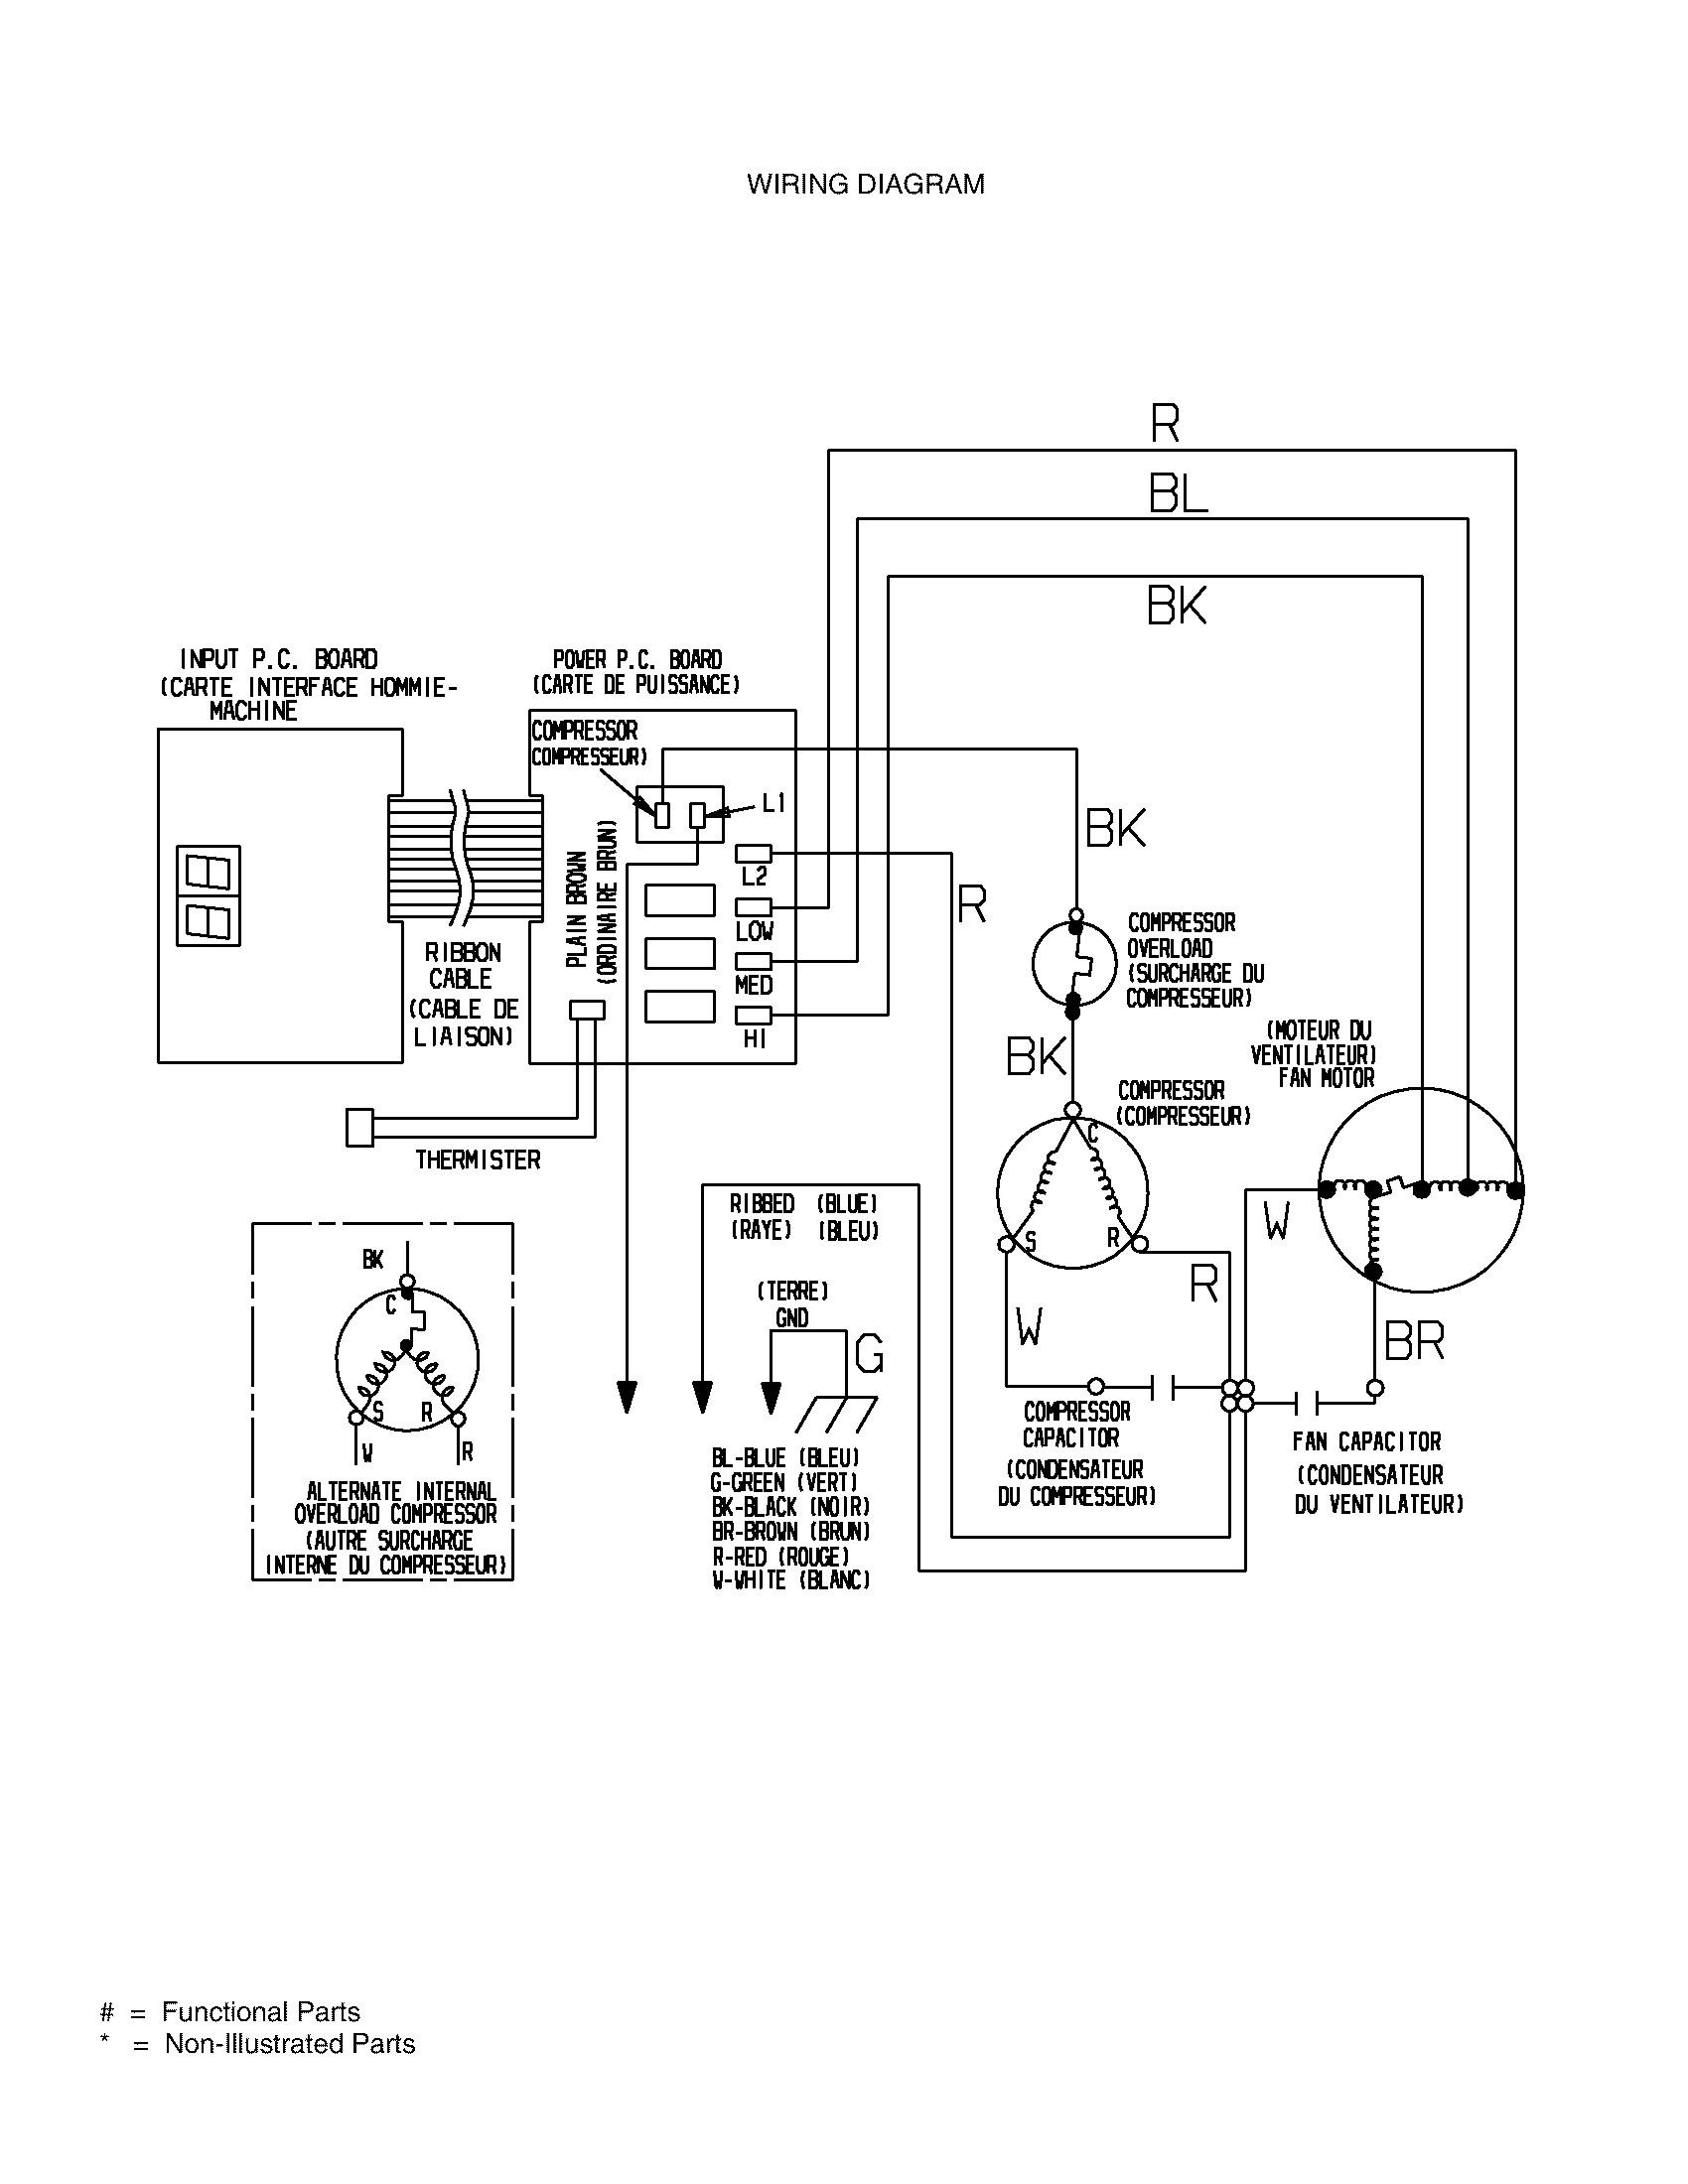 Air Conditioner Wiring Diagram Coleman Rv Air Conditioner Wiring Diagram – Wire Diagram Of Air Conditioner Wiring Diagram